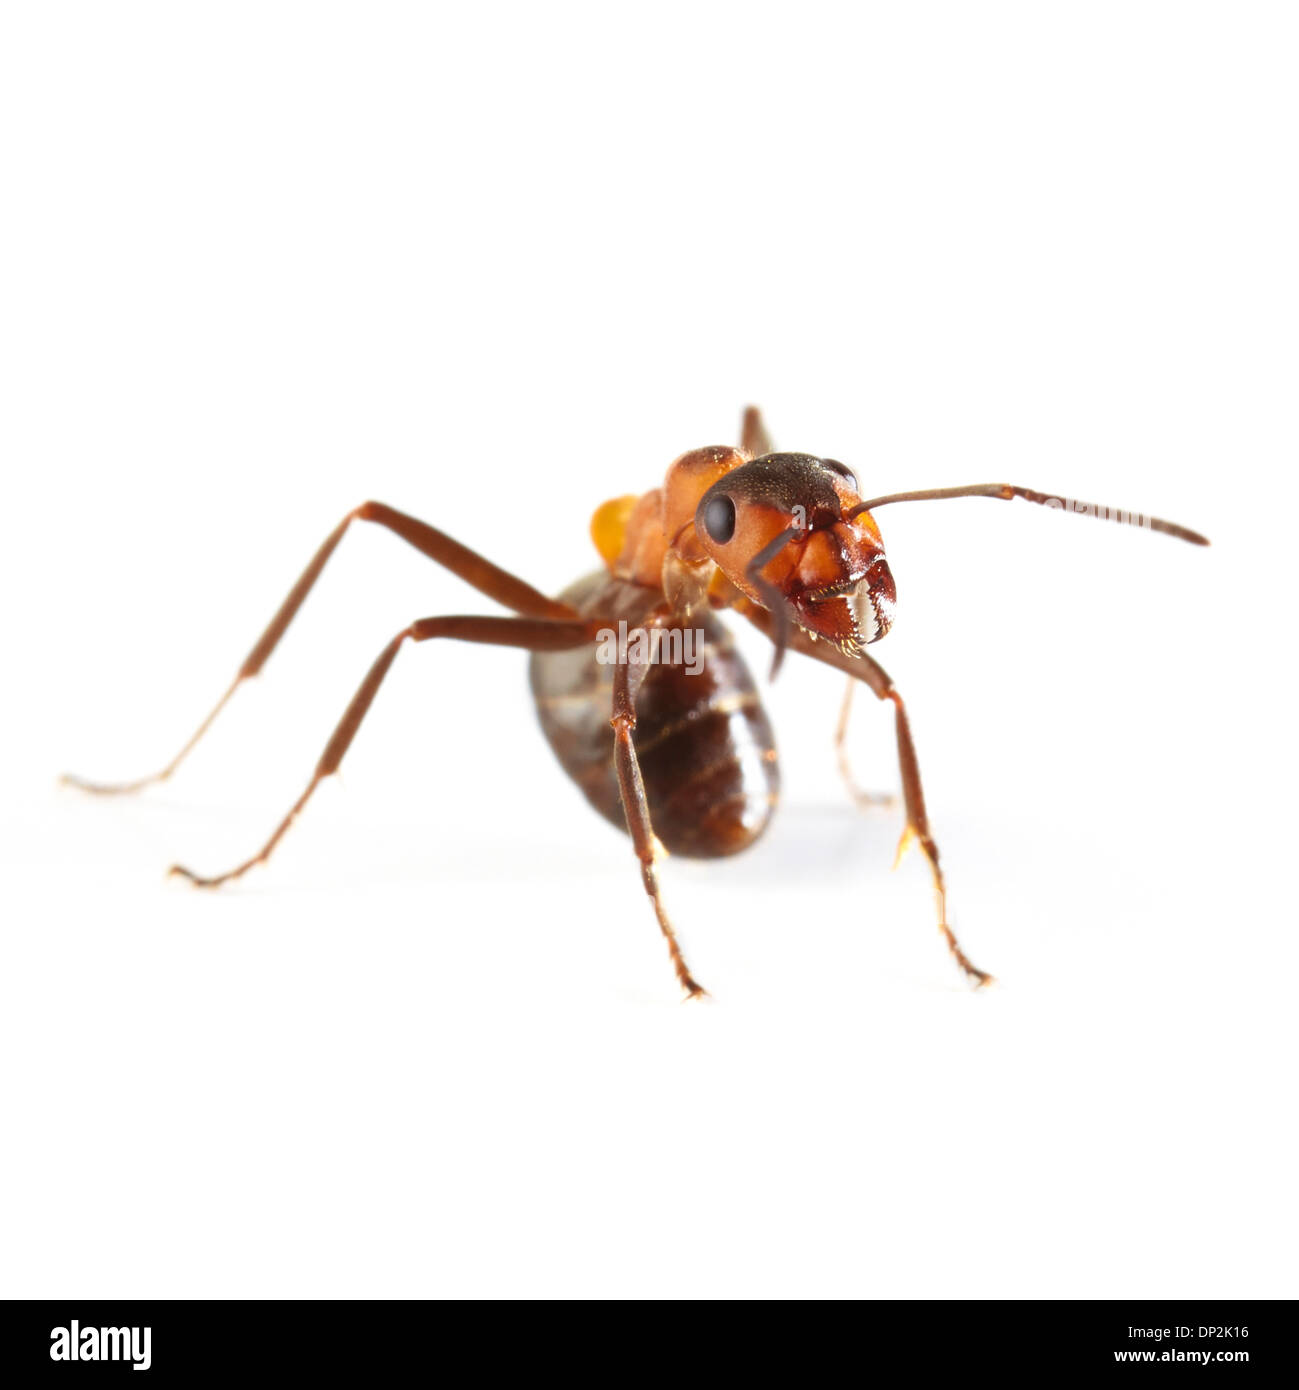 Hormiga de madera Imagen De Stock